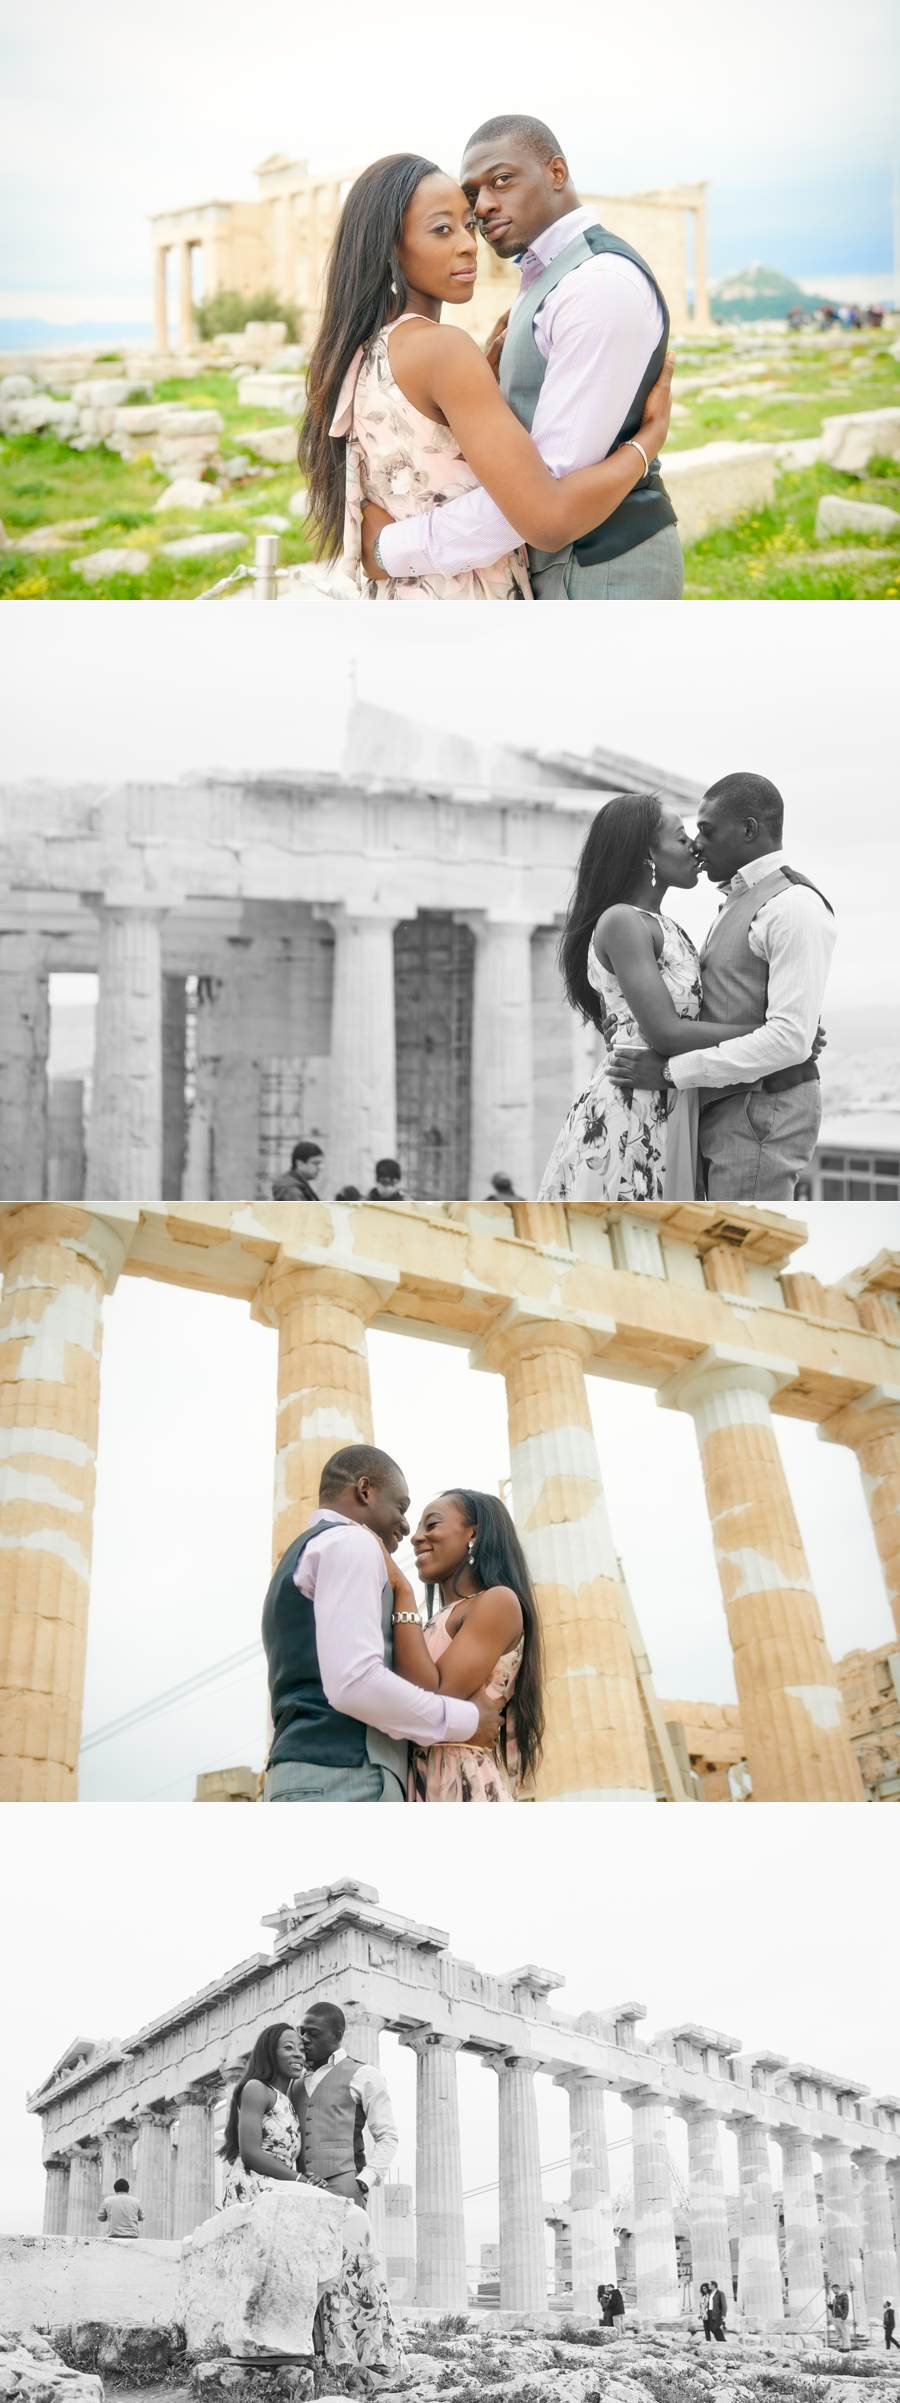 Tosin Bolu engagement photo shooting 02